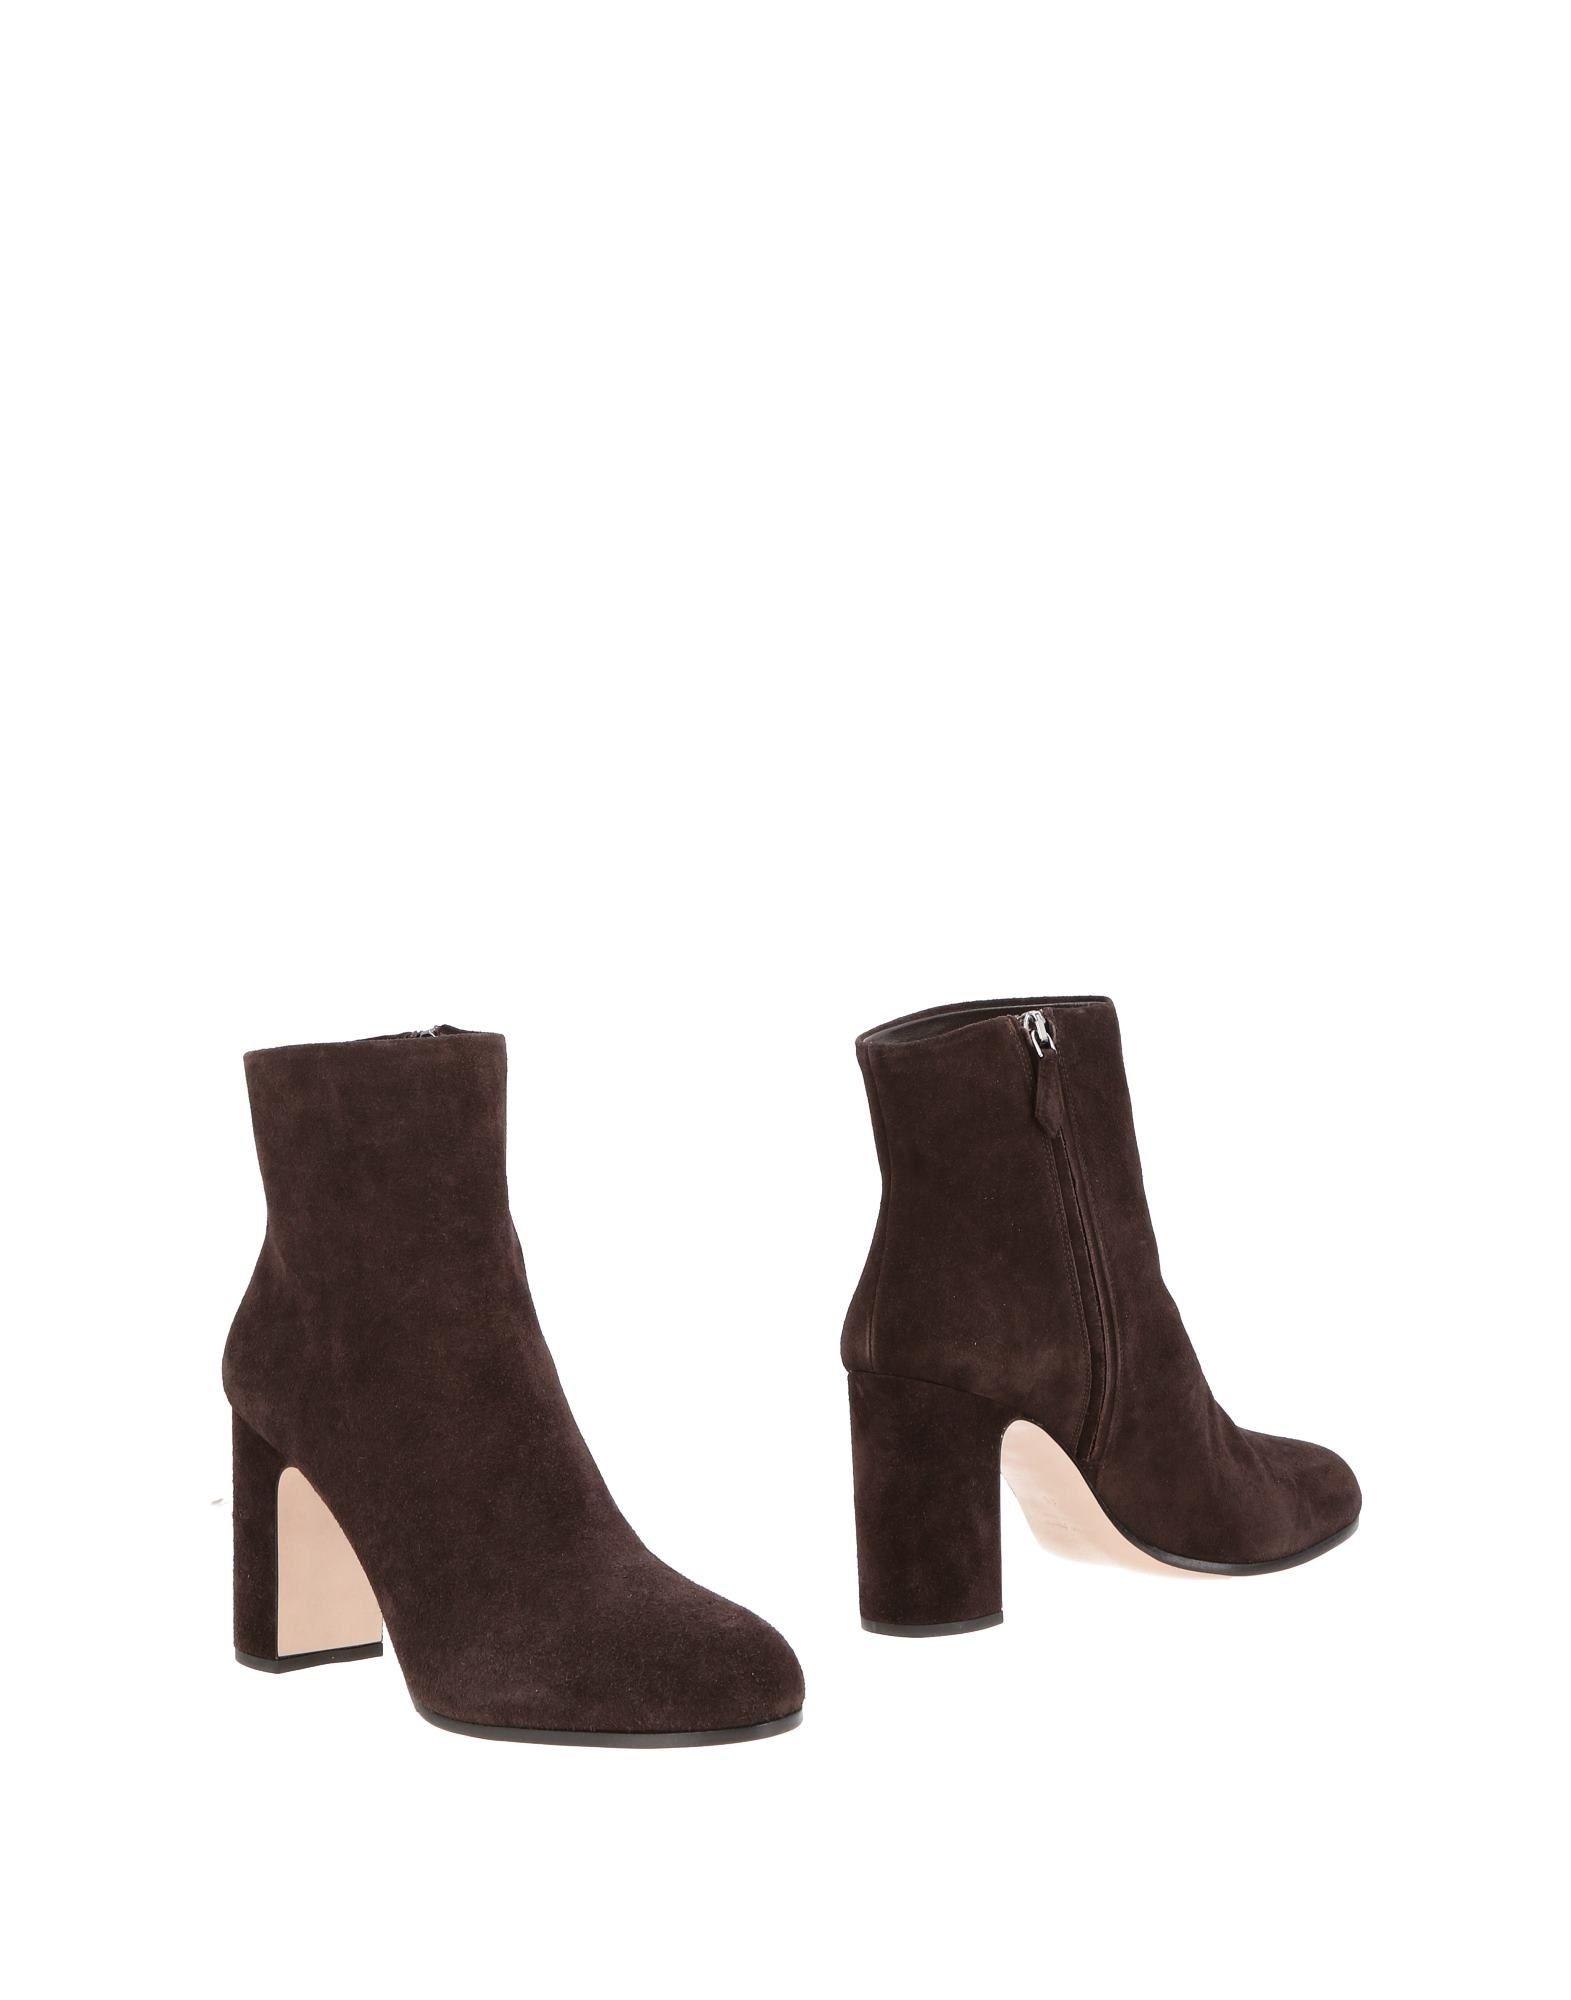 Miu Miu Stiefelette gut Damen  11340933CLGünstige gut Stiefelette aussehende Schuhe f9b2ae